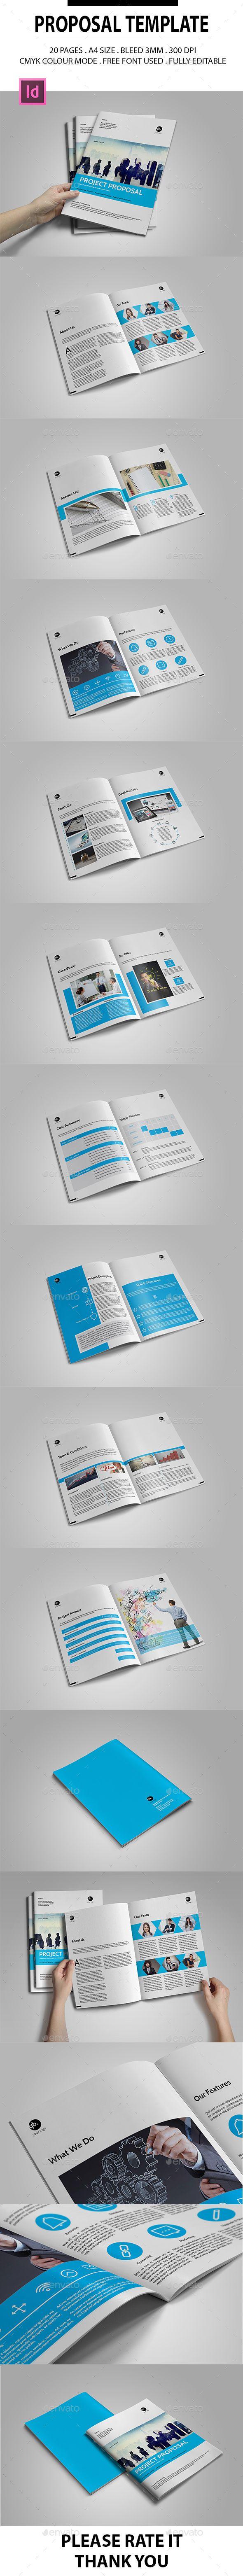 Proposal Template InDesign INDD design Download httpgraphicrivernet